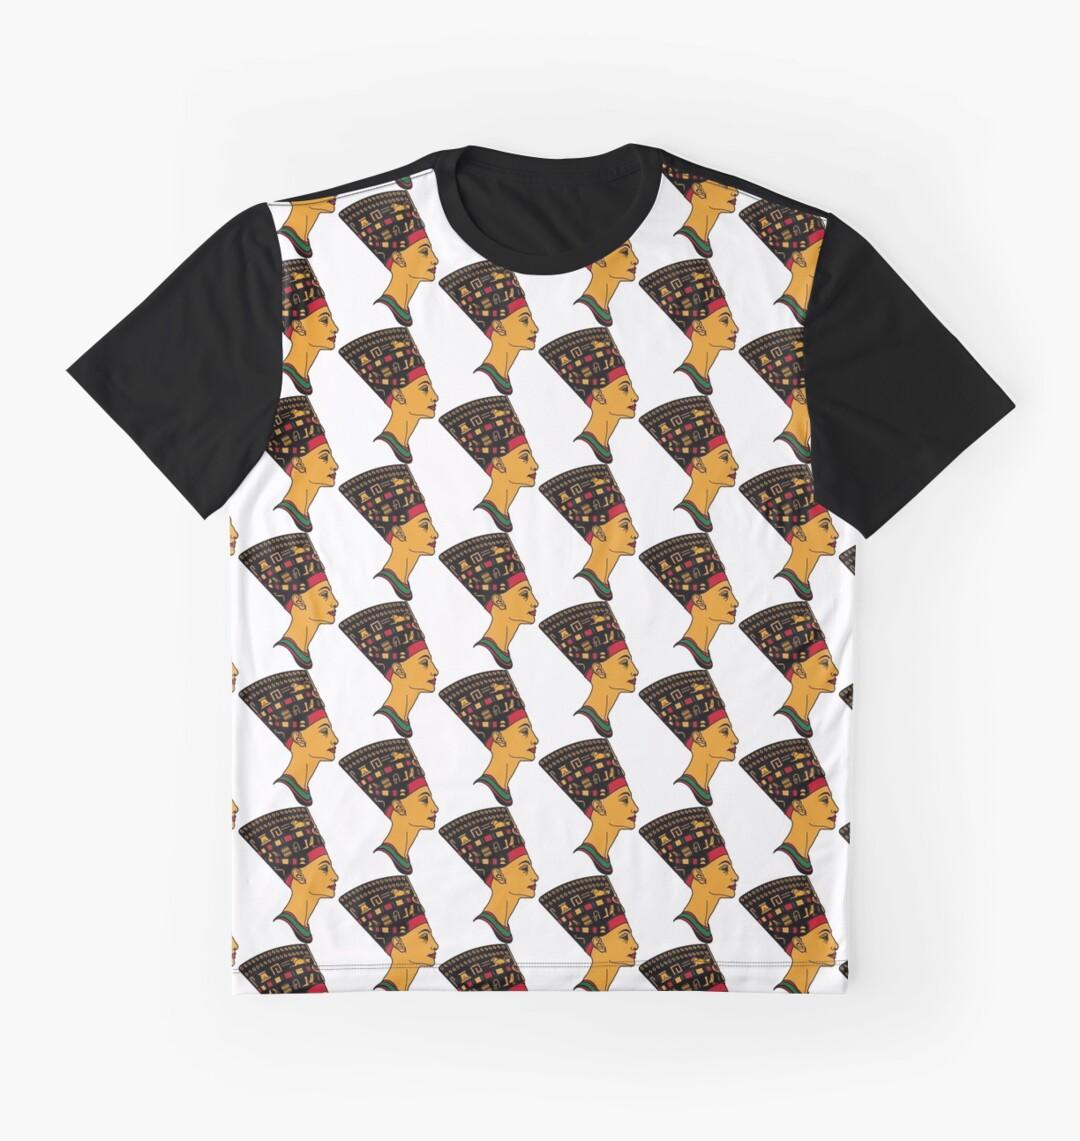 Design shirt redbubble - Queen Nefertiti Design Graphic T Shirts